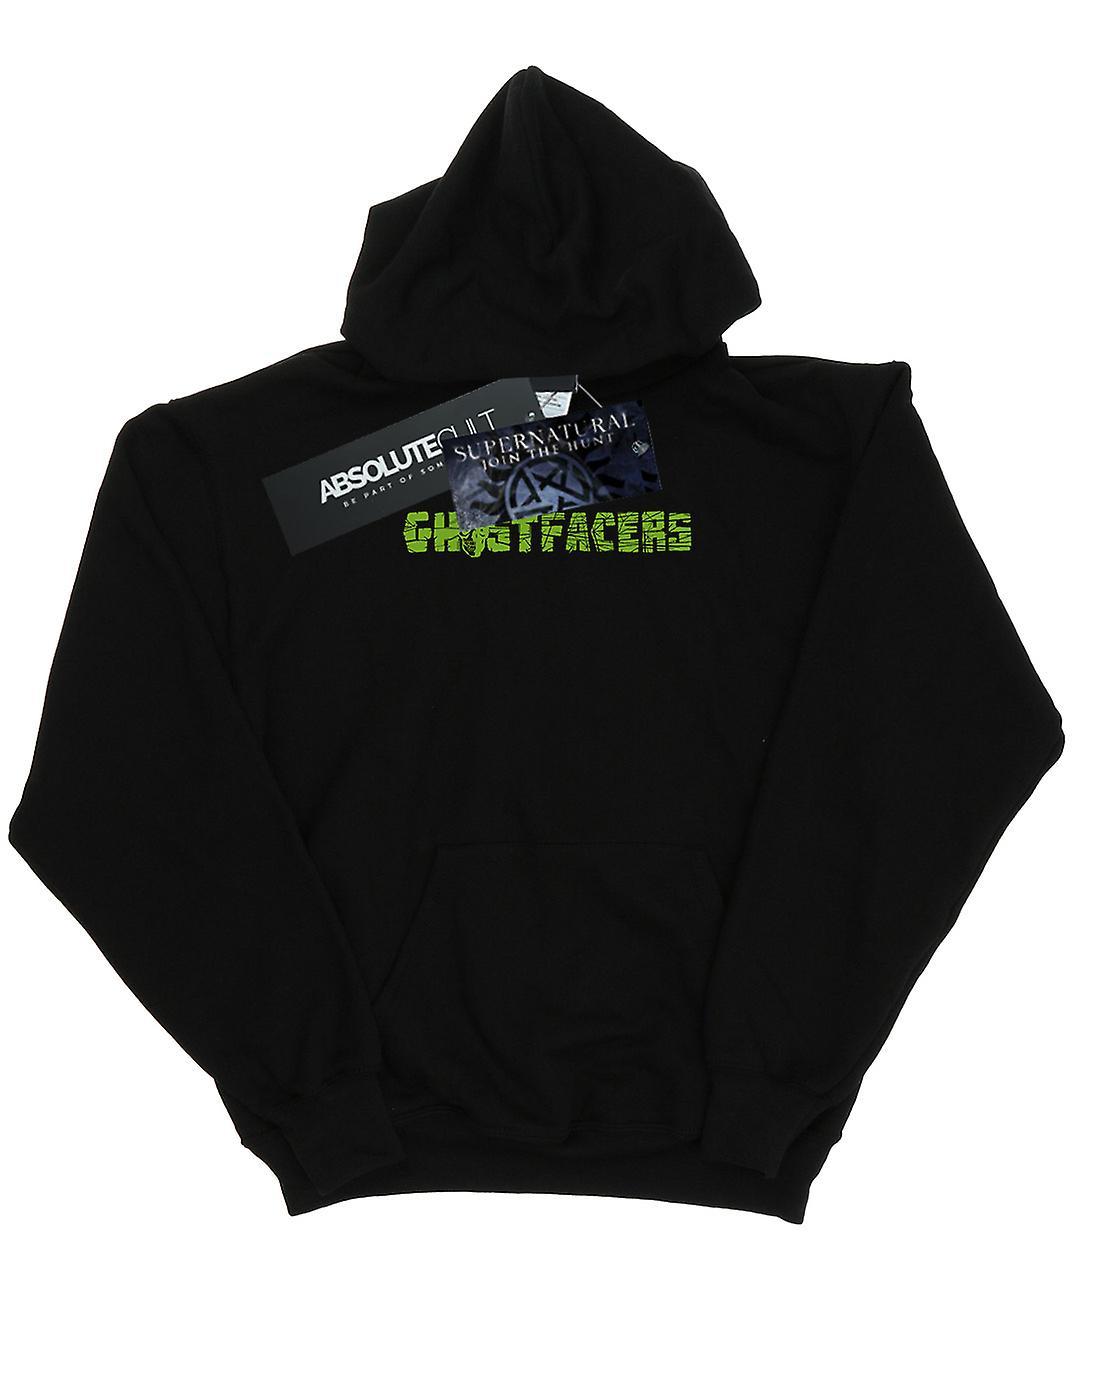 Supernatural Men's Ghostfacers Logo Hoodie